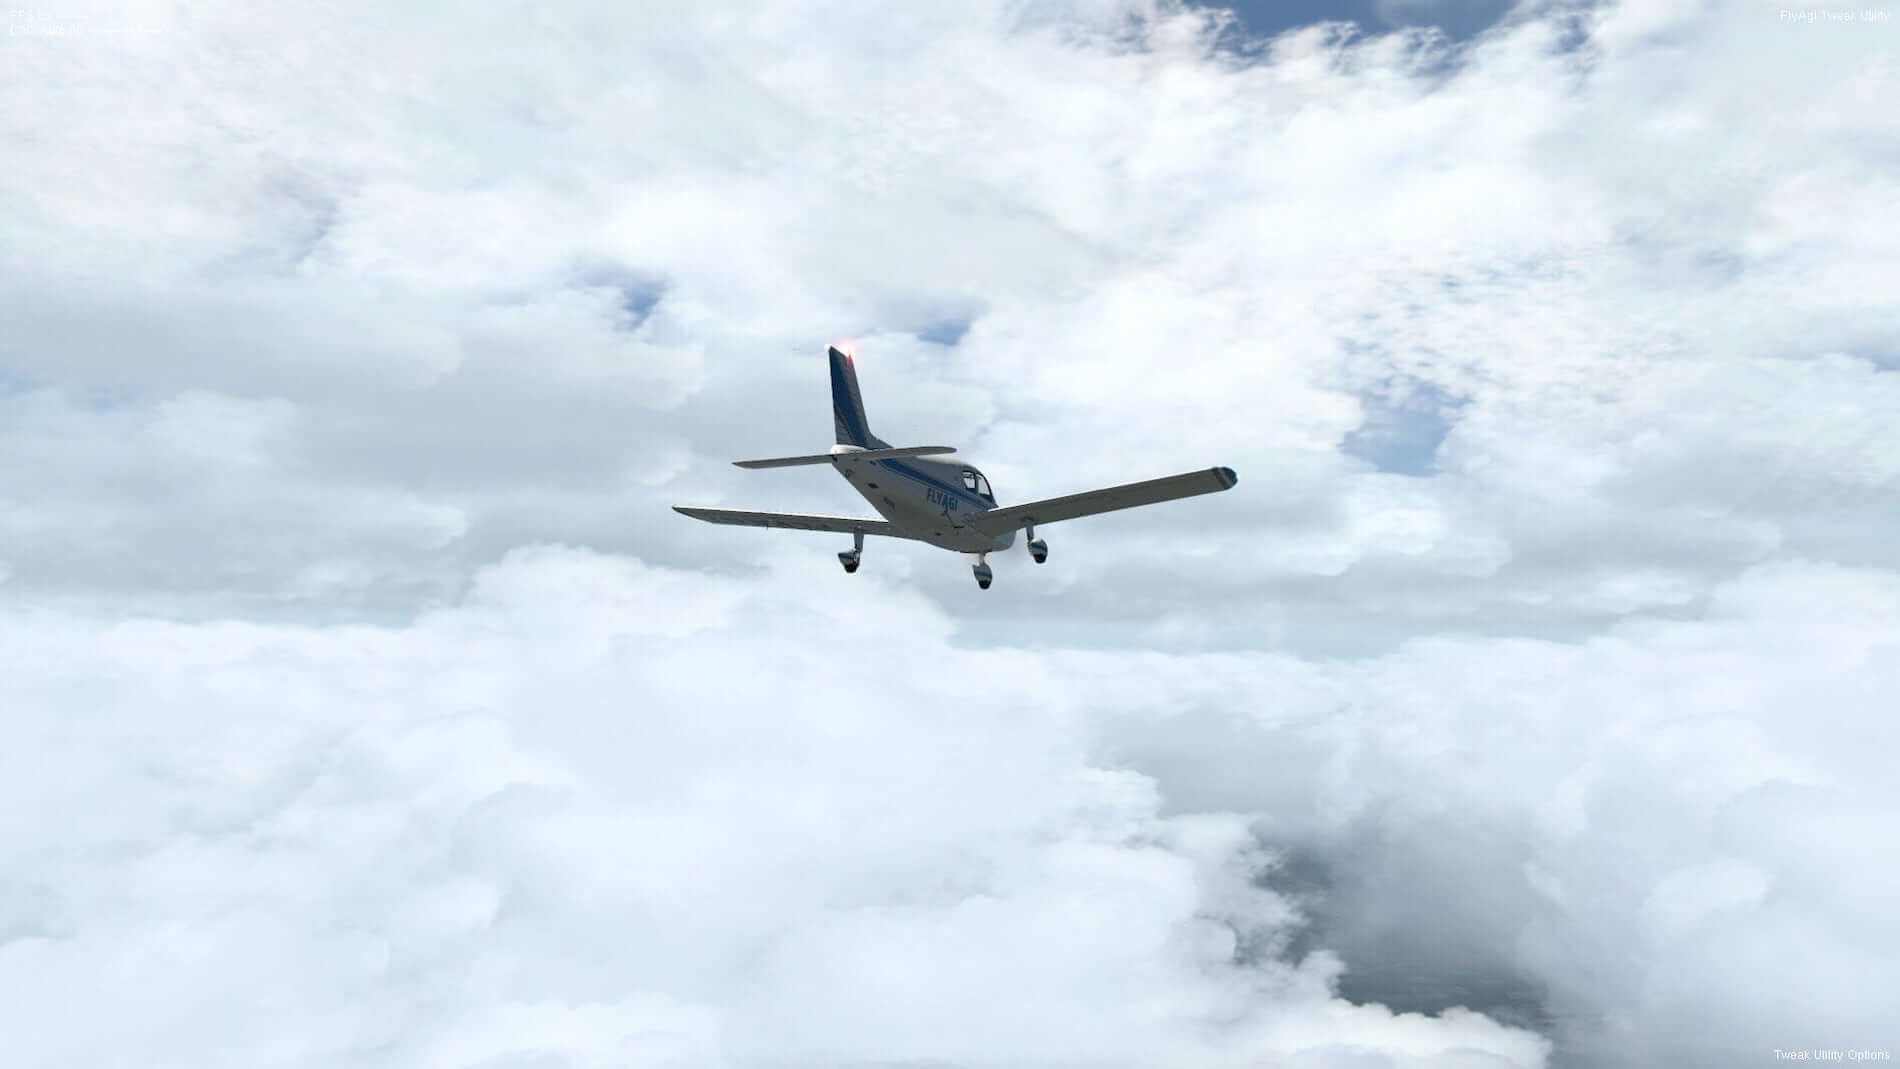 FlyAGI-FTU-Weather-System-ASXP-25